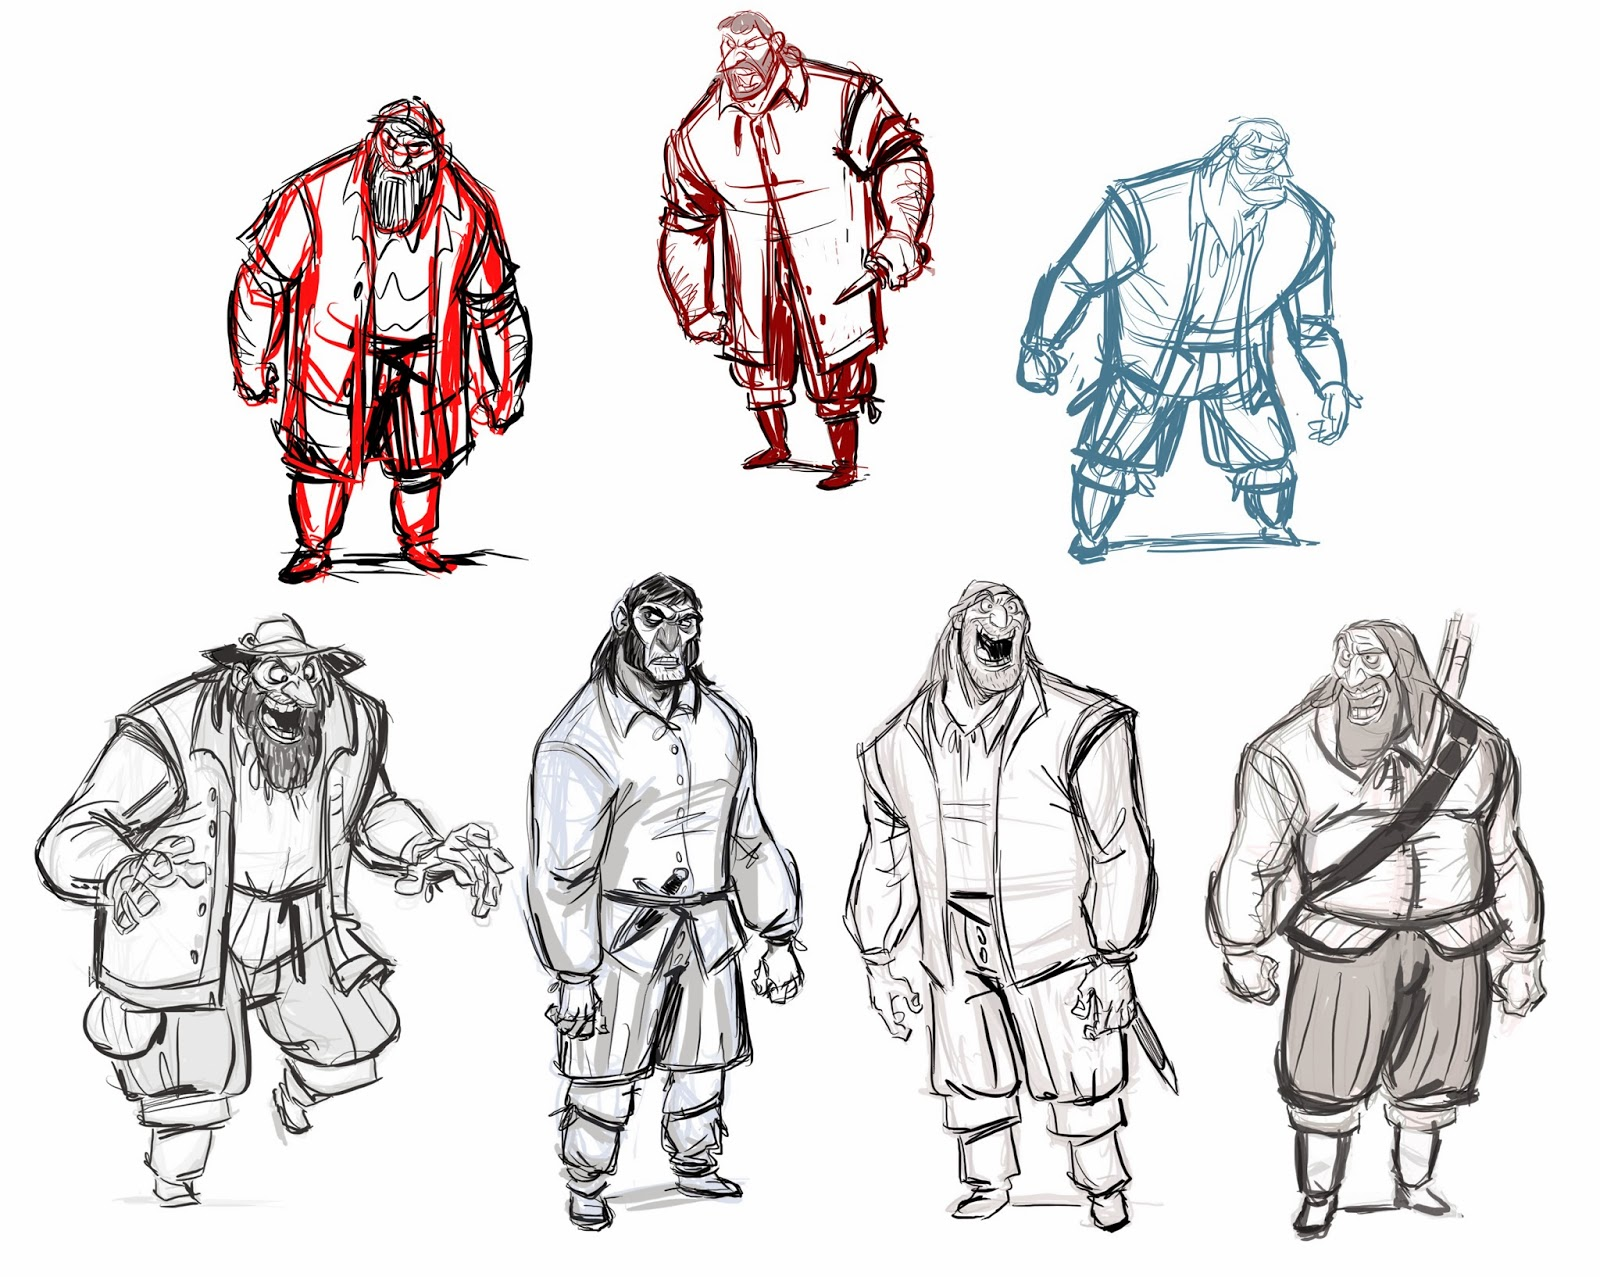 Character Design Reel : Never let me cus if i then im gin pilgrim